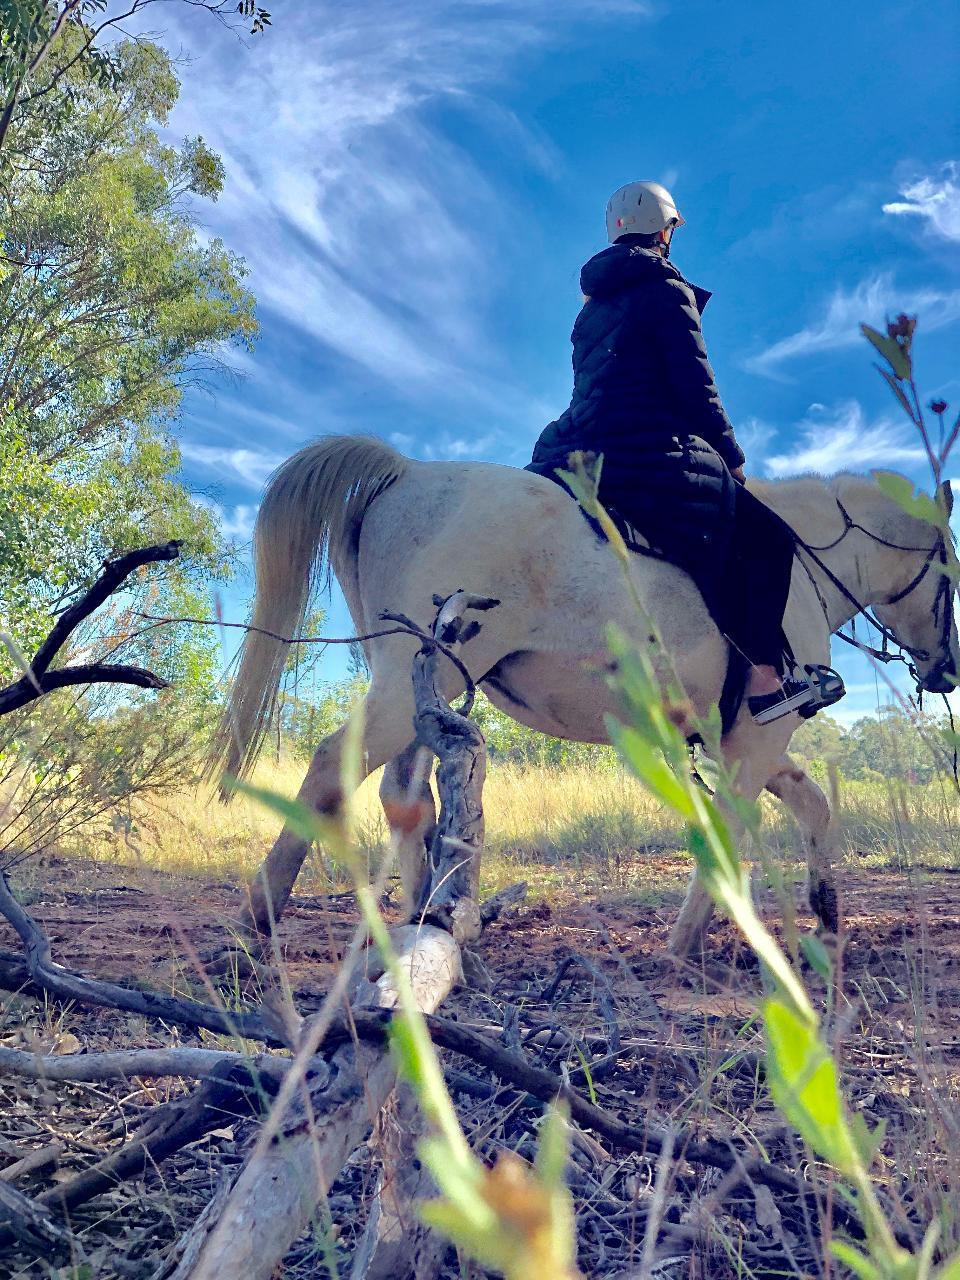 2-hour Private Horseback Vineyard Trail Ride